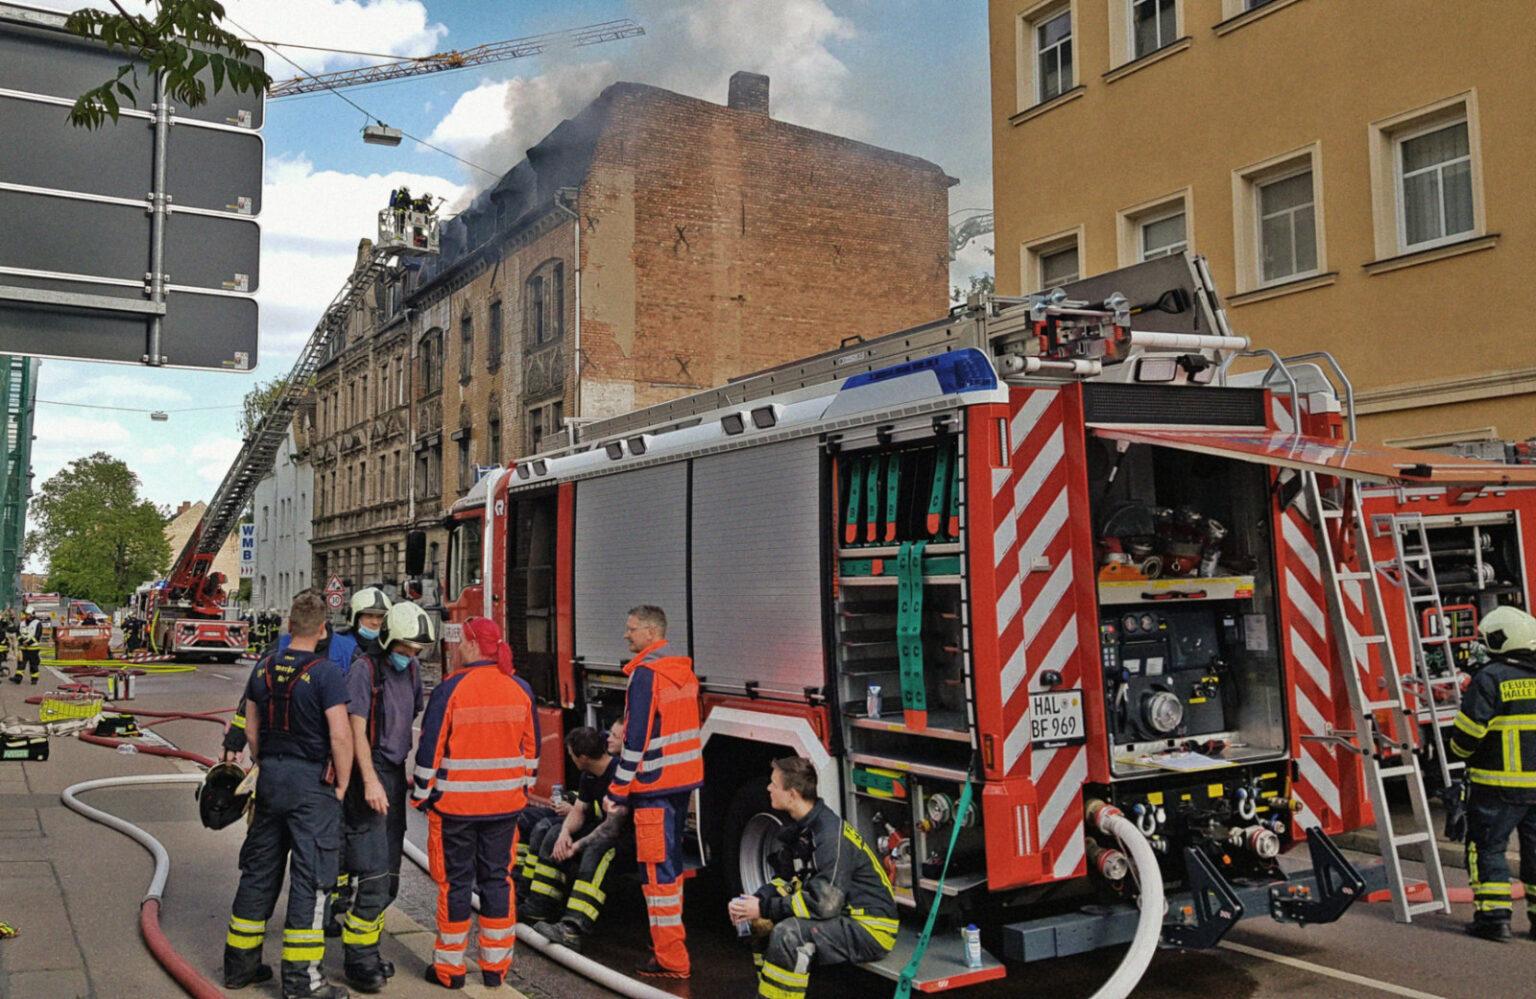 Stadt Bei Nürnberg Rätsel